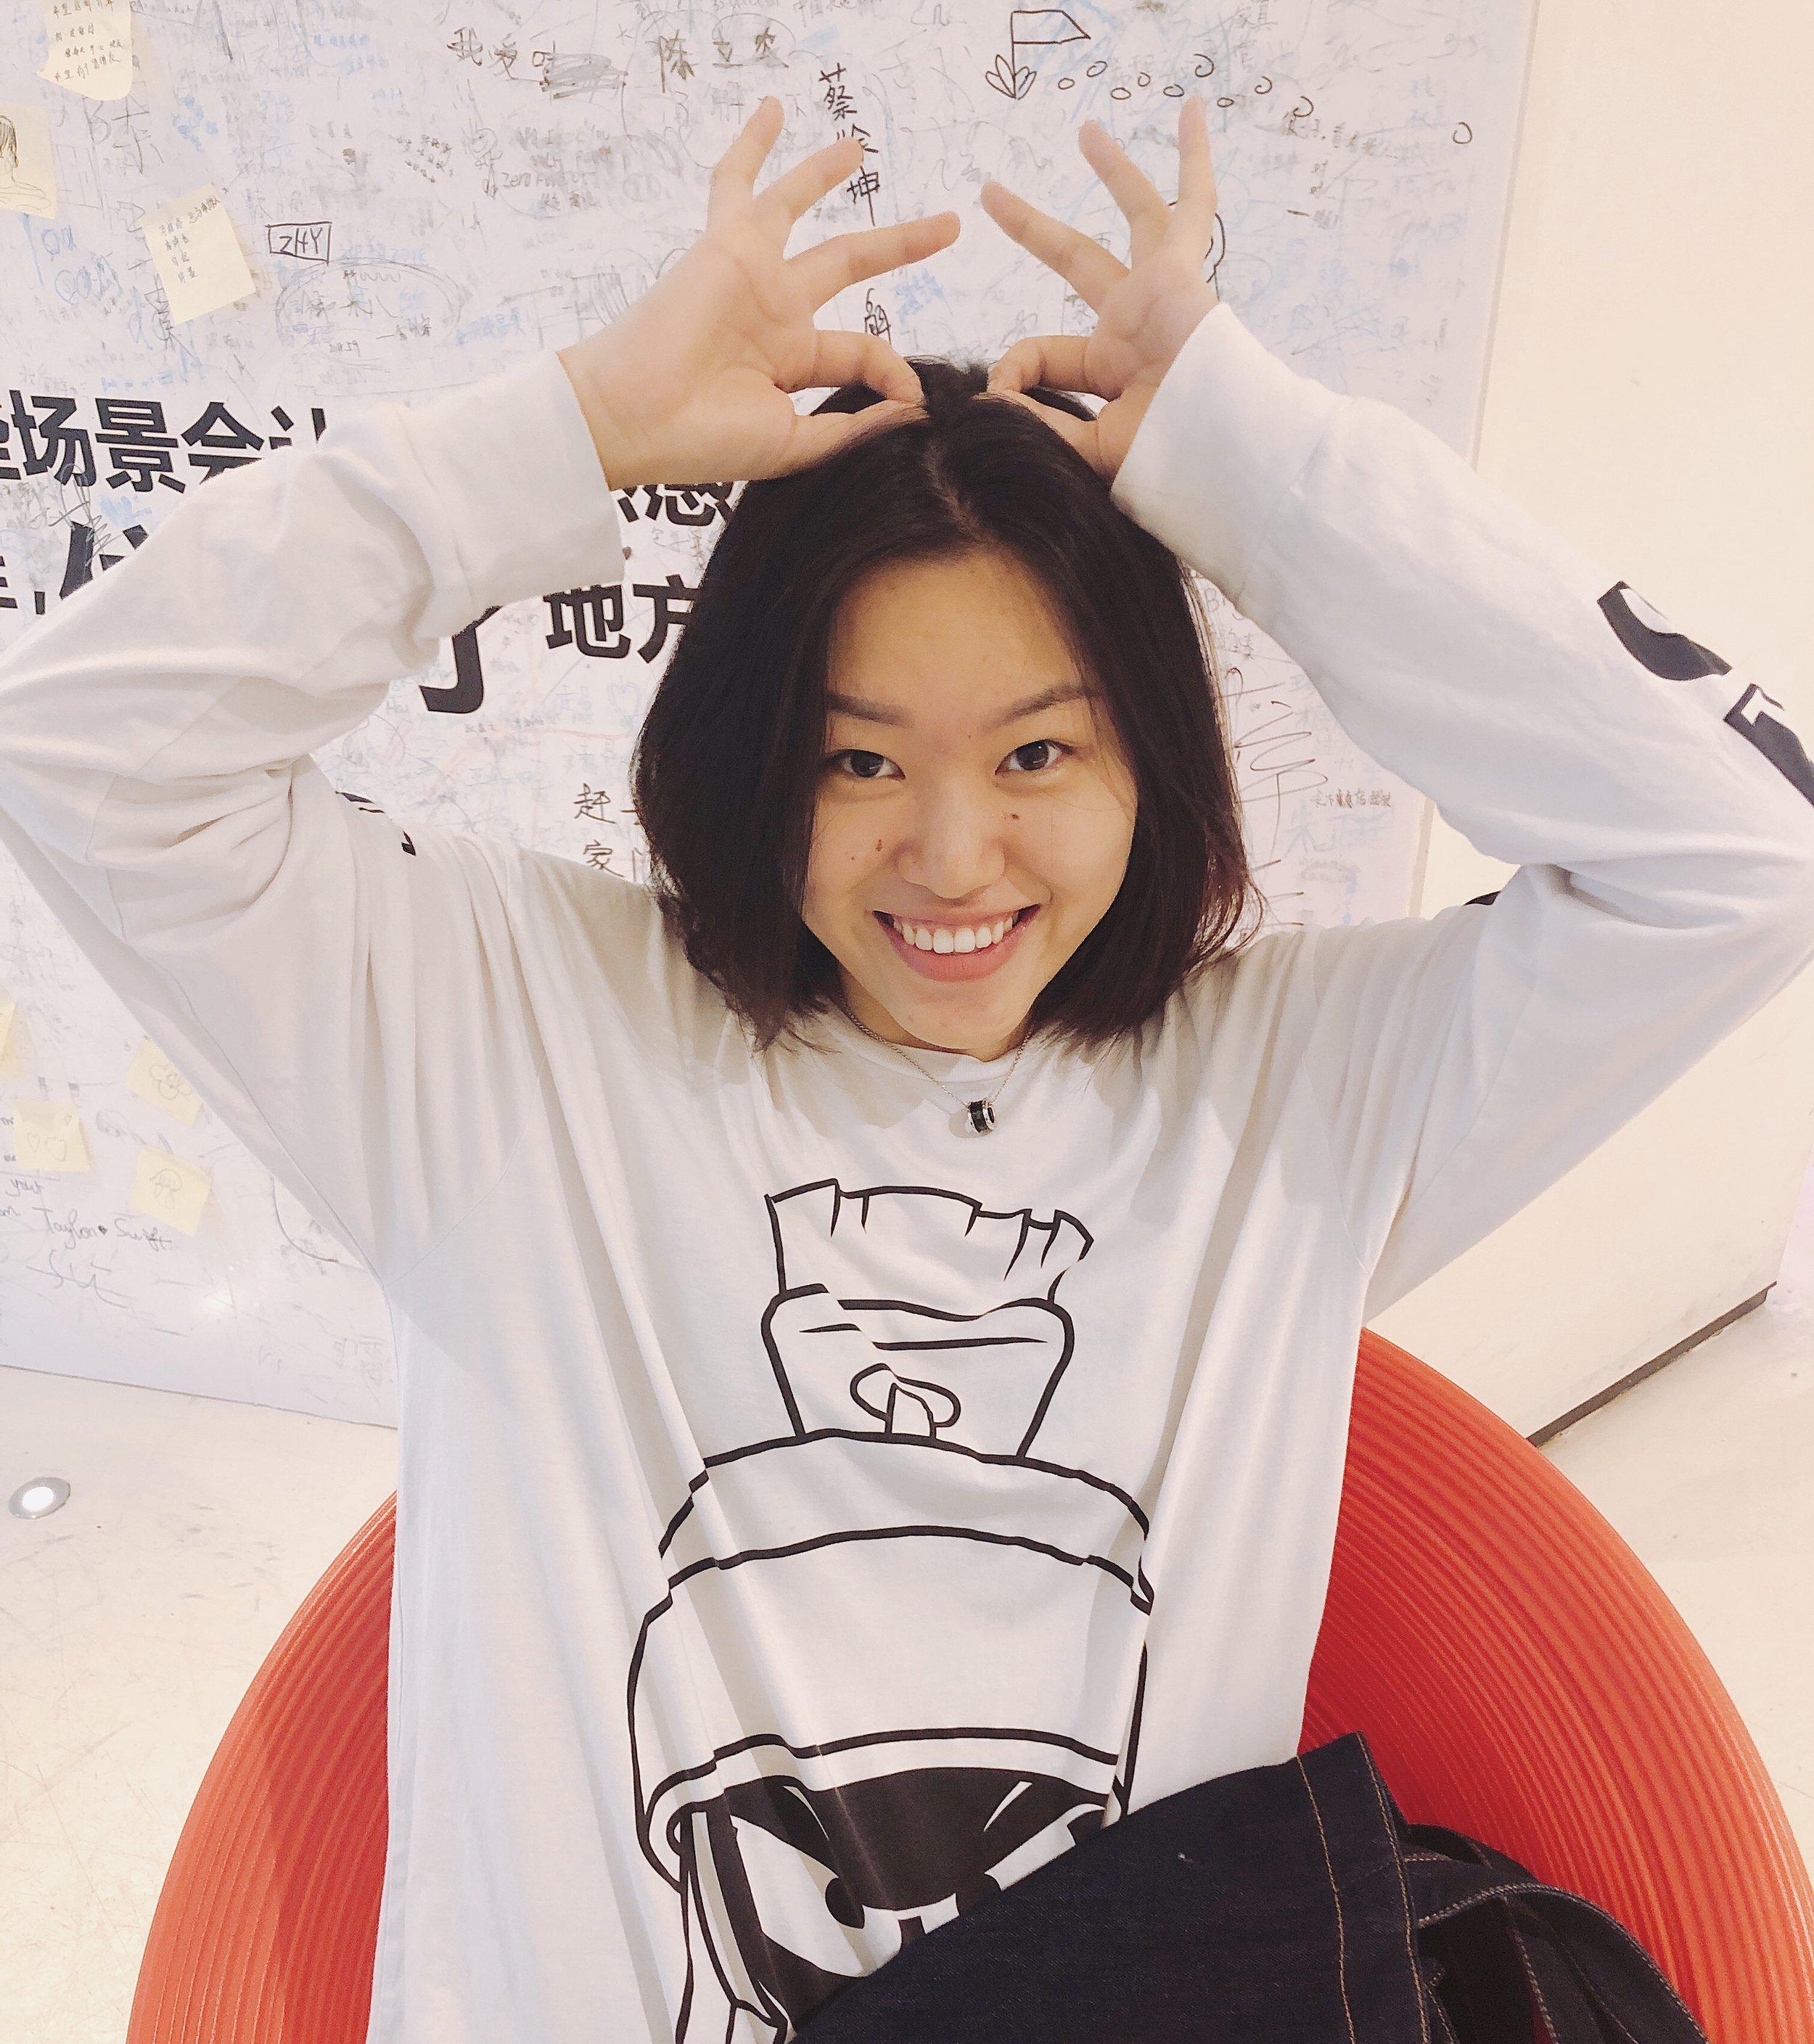 IMG_1238 - JUJU Wang.jpg